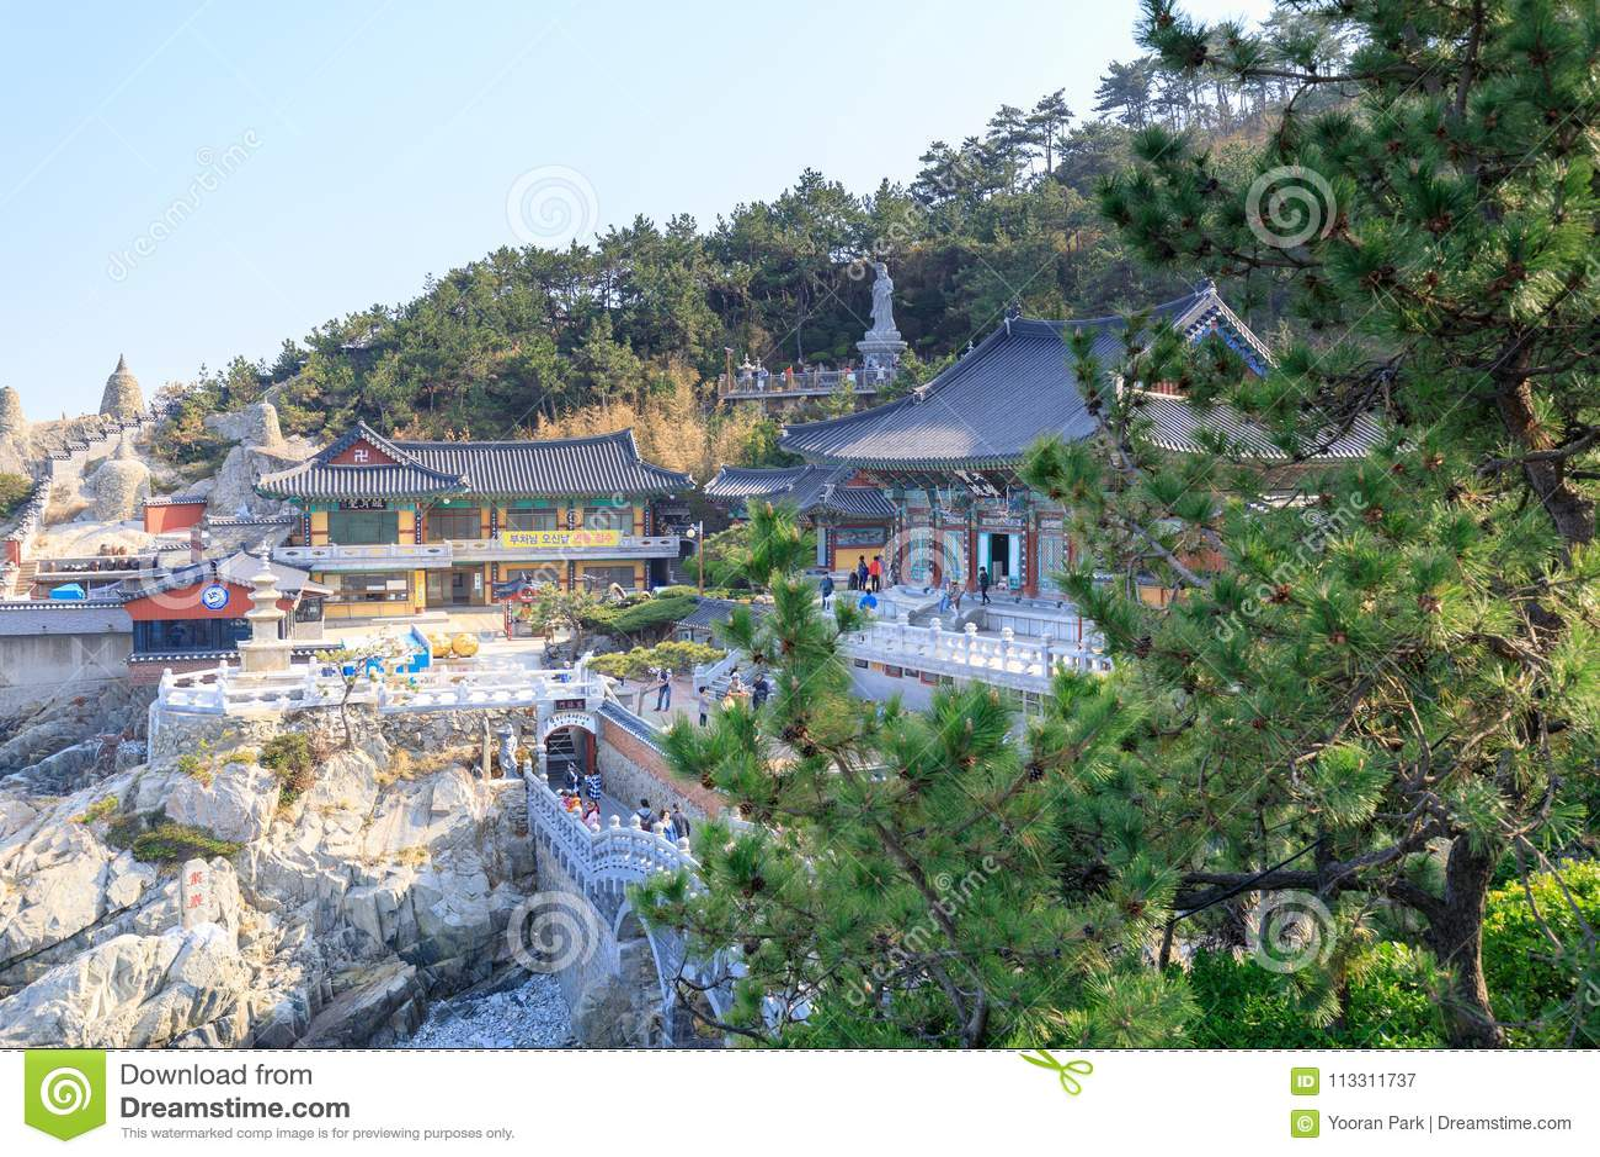 Haedong yonggungsa seaside temple in Busan